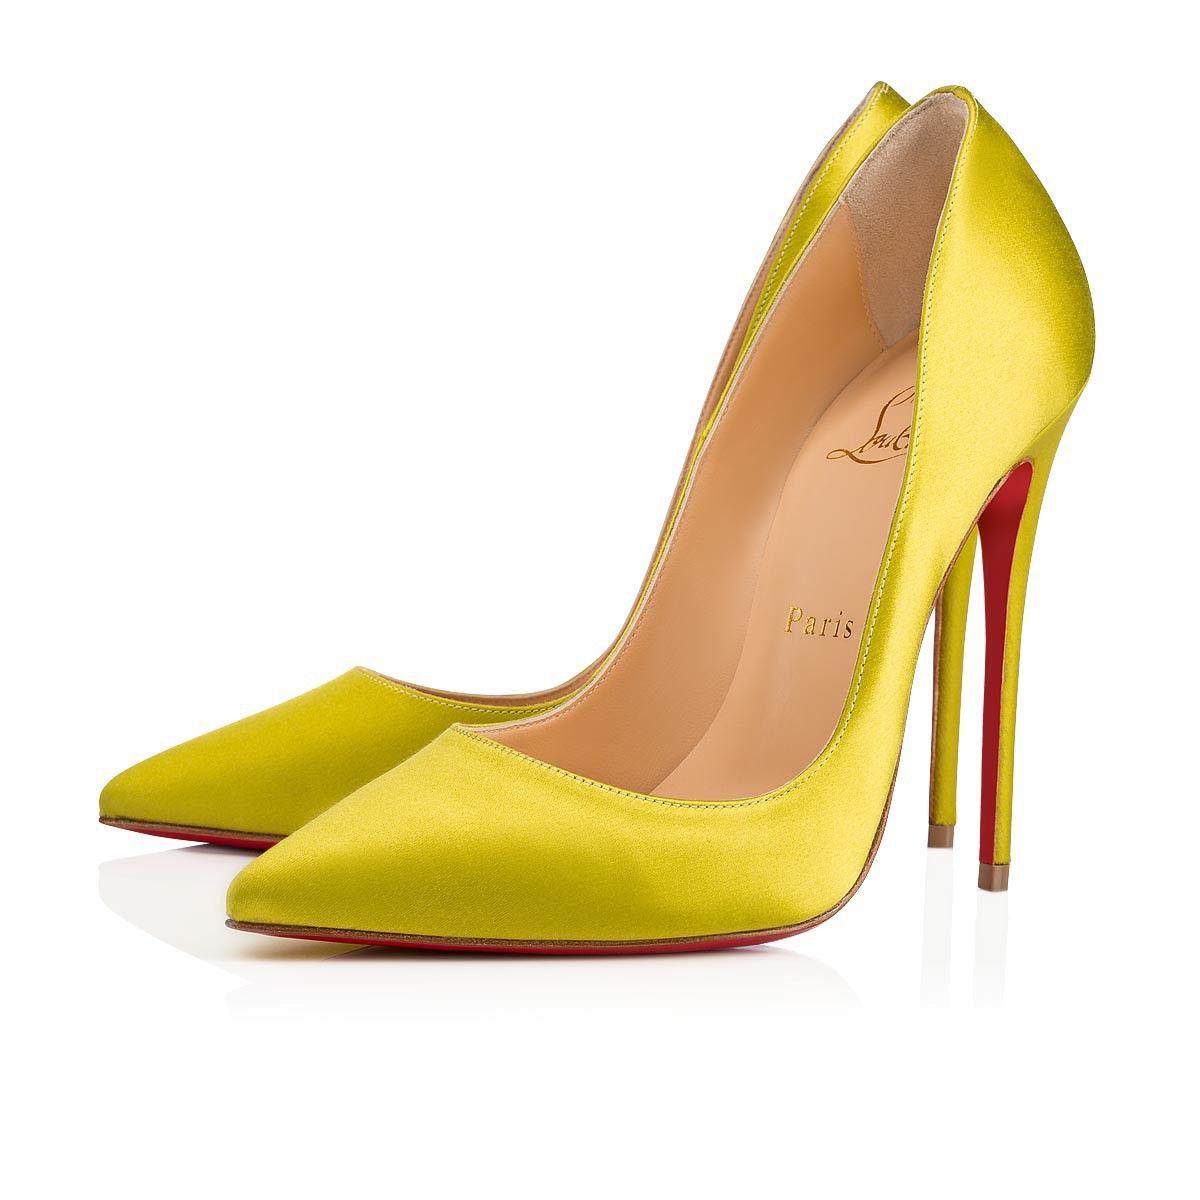 fcb3df68e9 Shoes - So Kate - Christian Louboutin